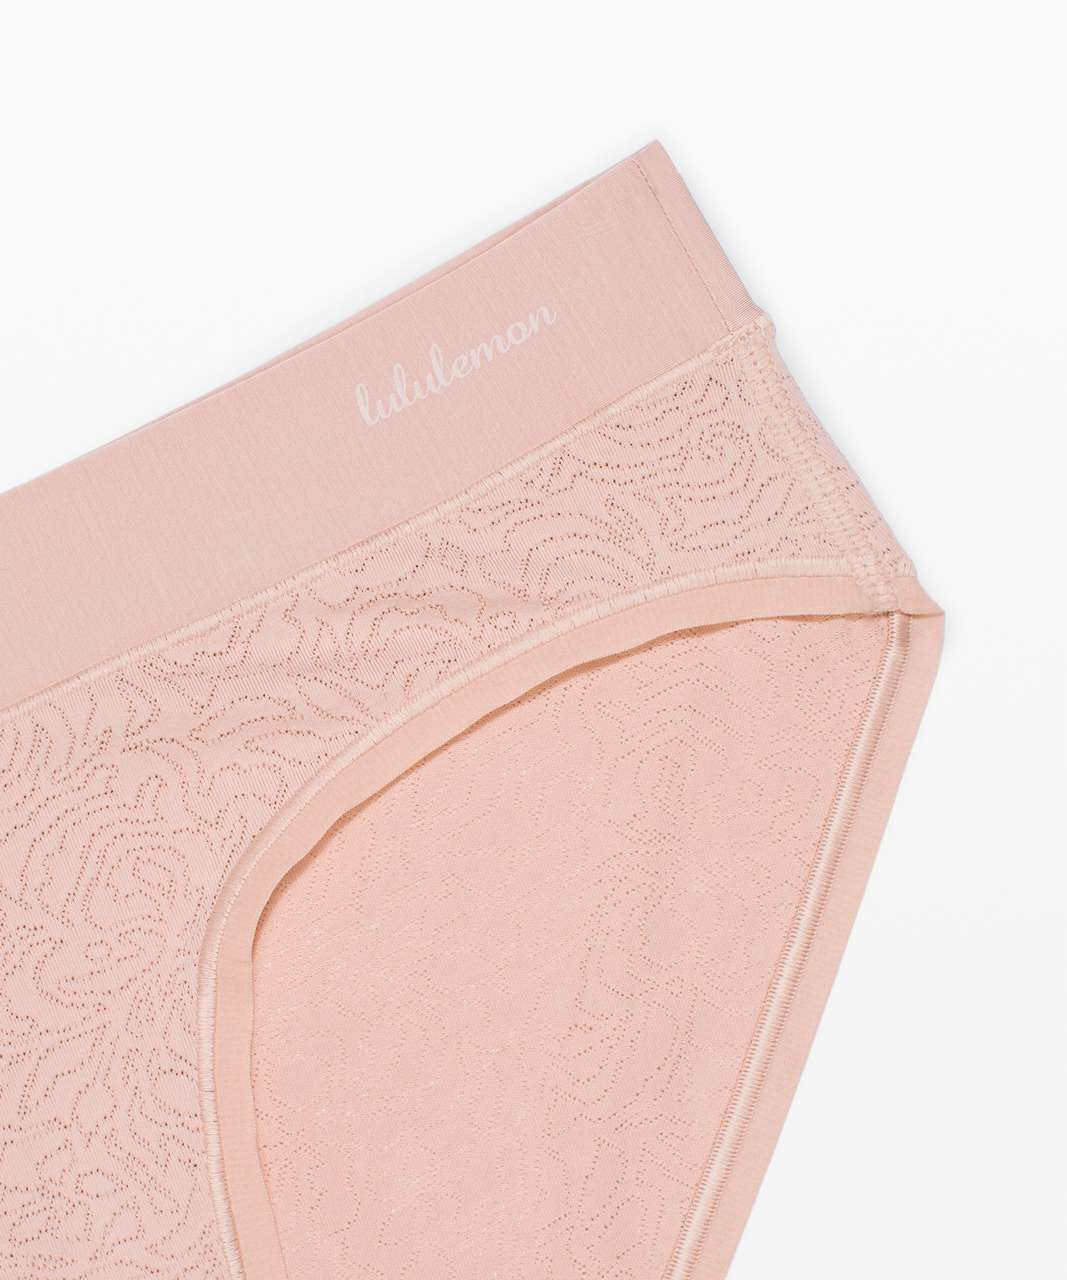 Lululemon Soft Breathable Bikini *Lace 3 Pack - Garnet / Misty Shell / Black